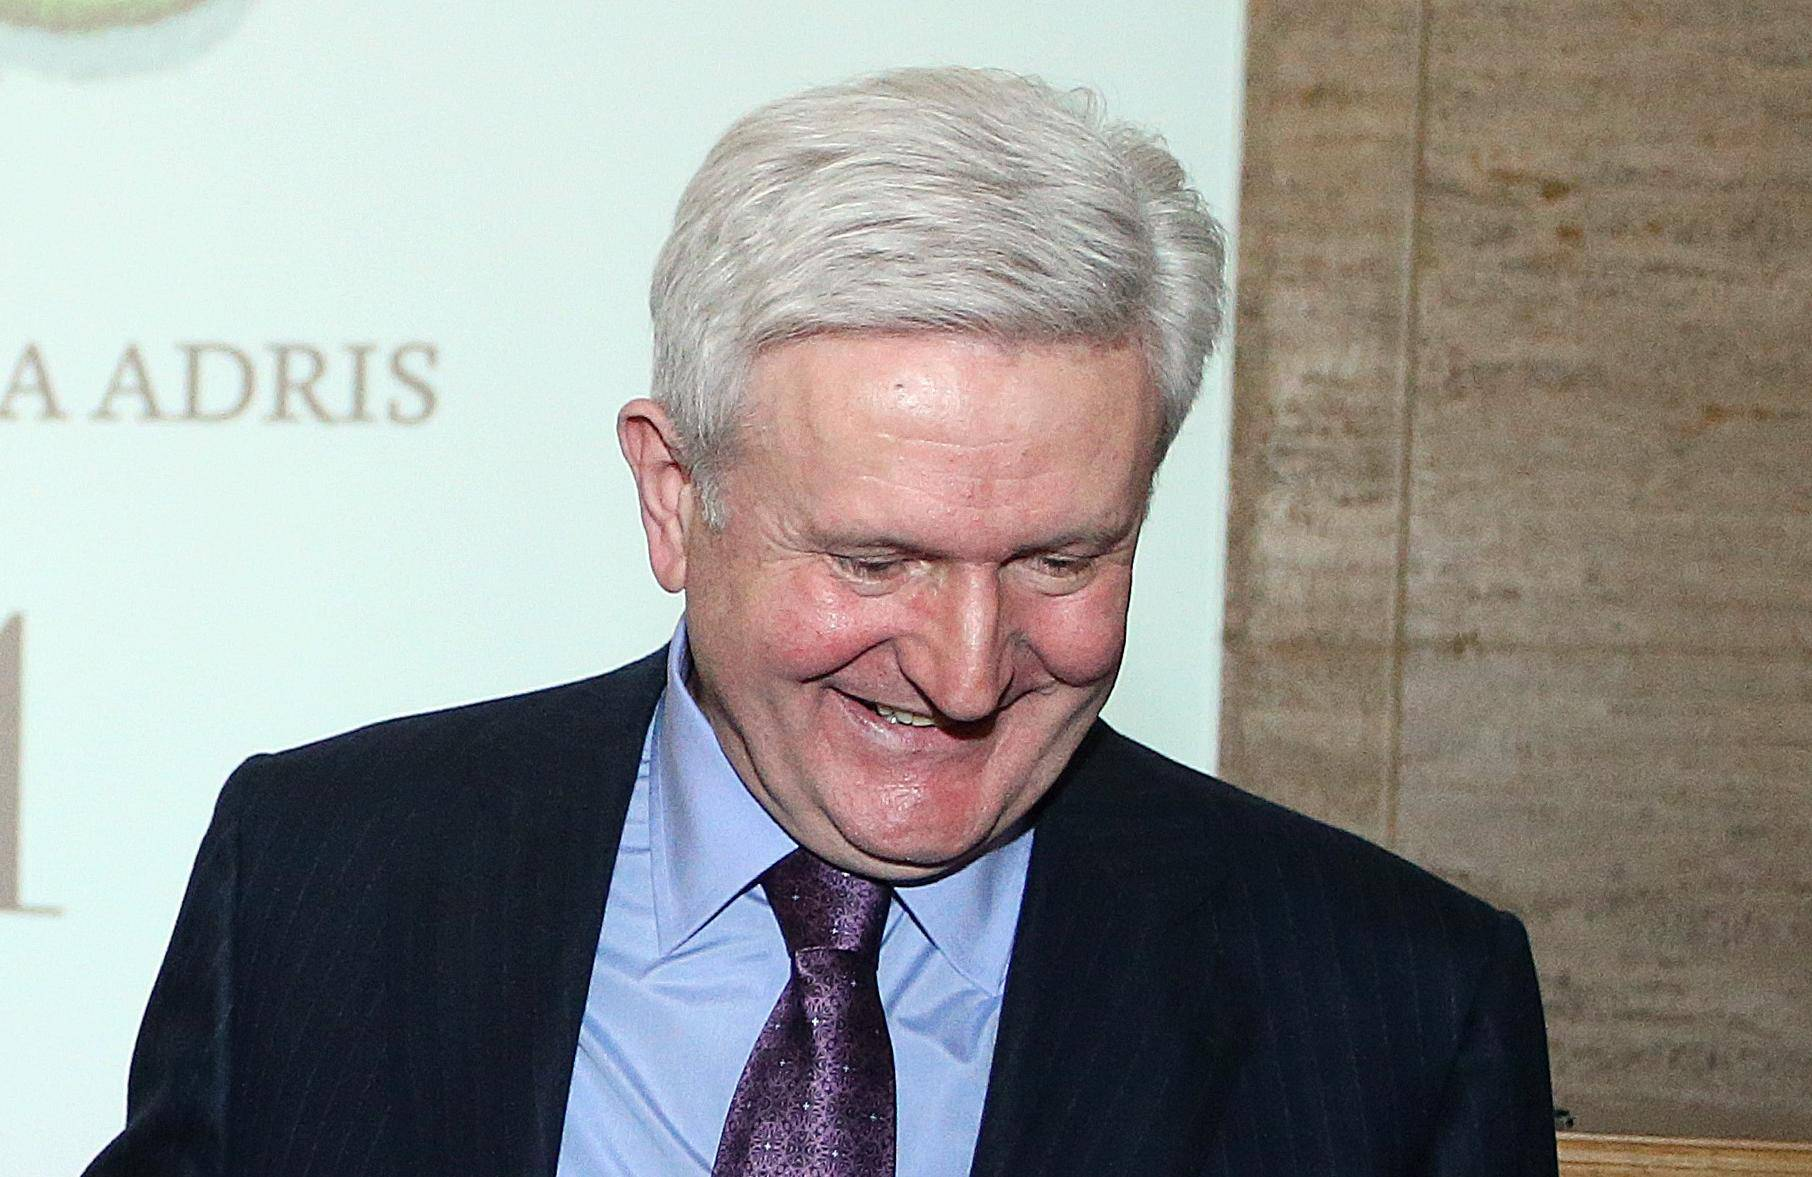 Bi li nas doista spasilo da Ivica Todorić završi iza rešetaka?